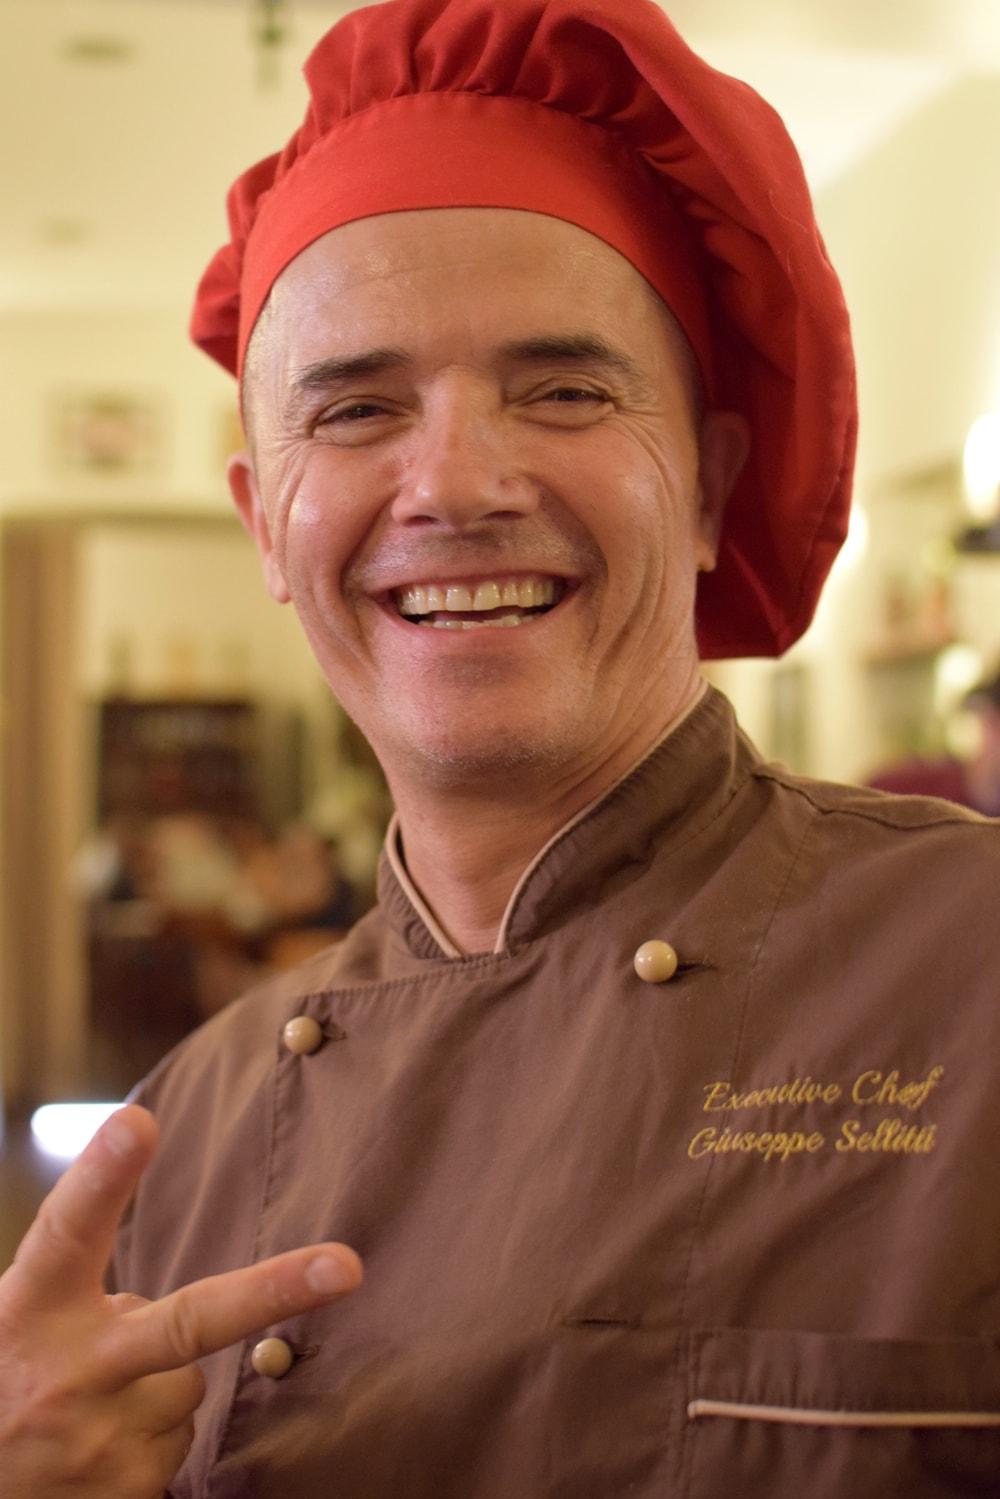 giuseppe selliti gluten free chef at officina37 milan